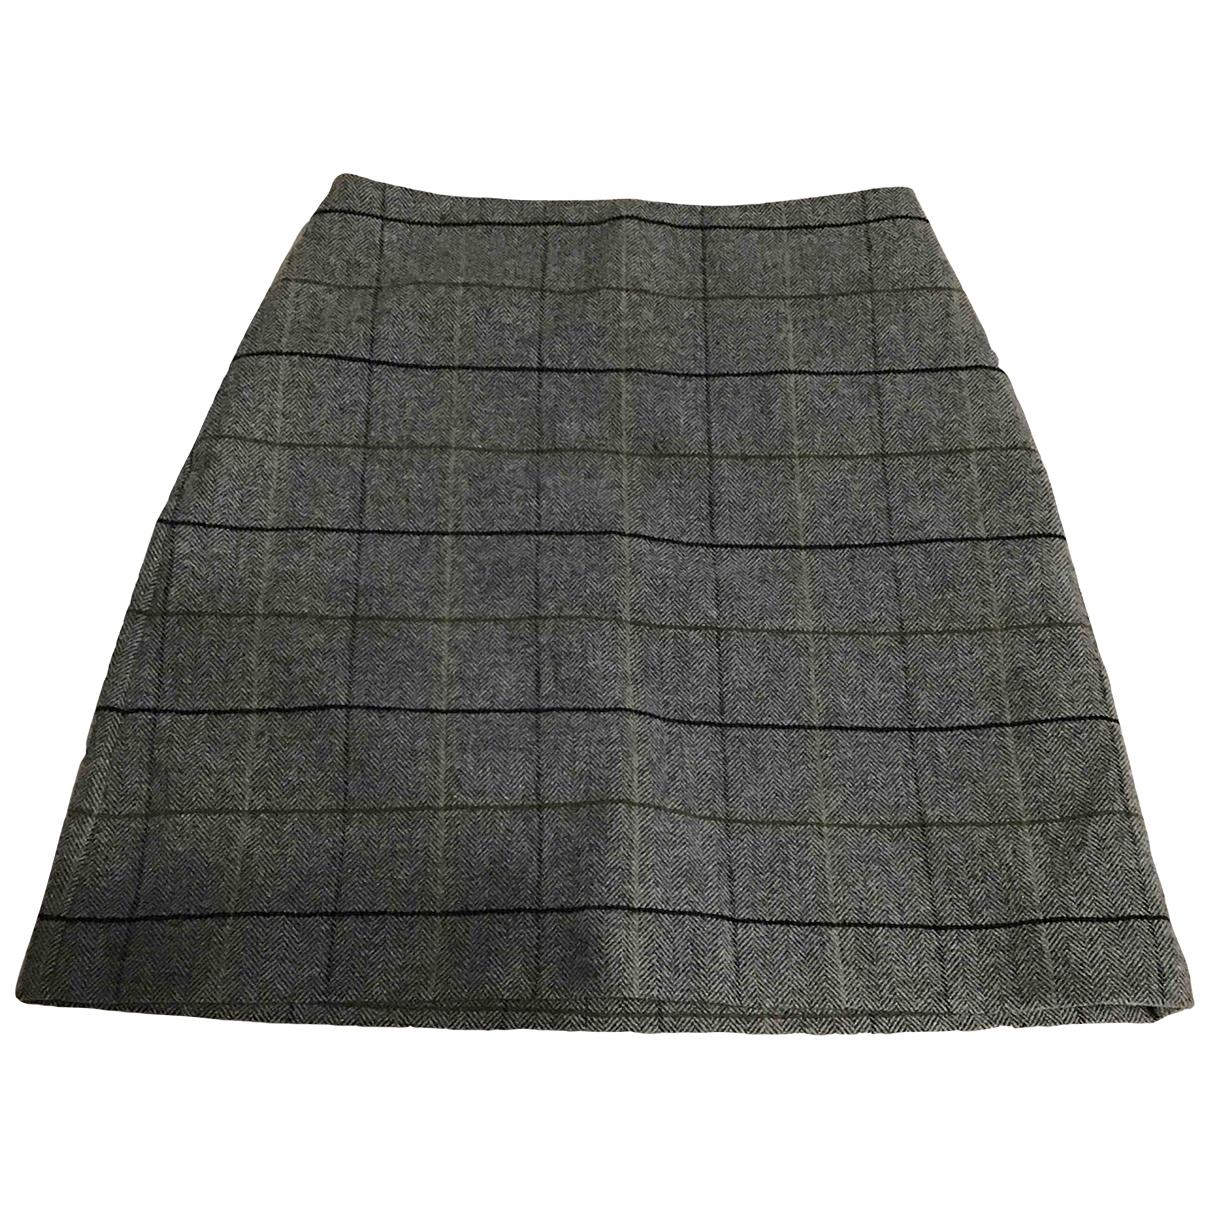 Uniqlo \N Grey skirt for Women XS International